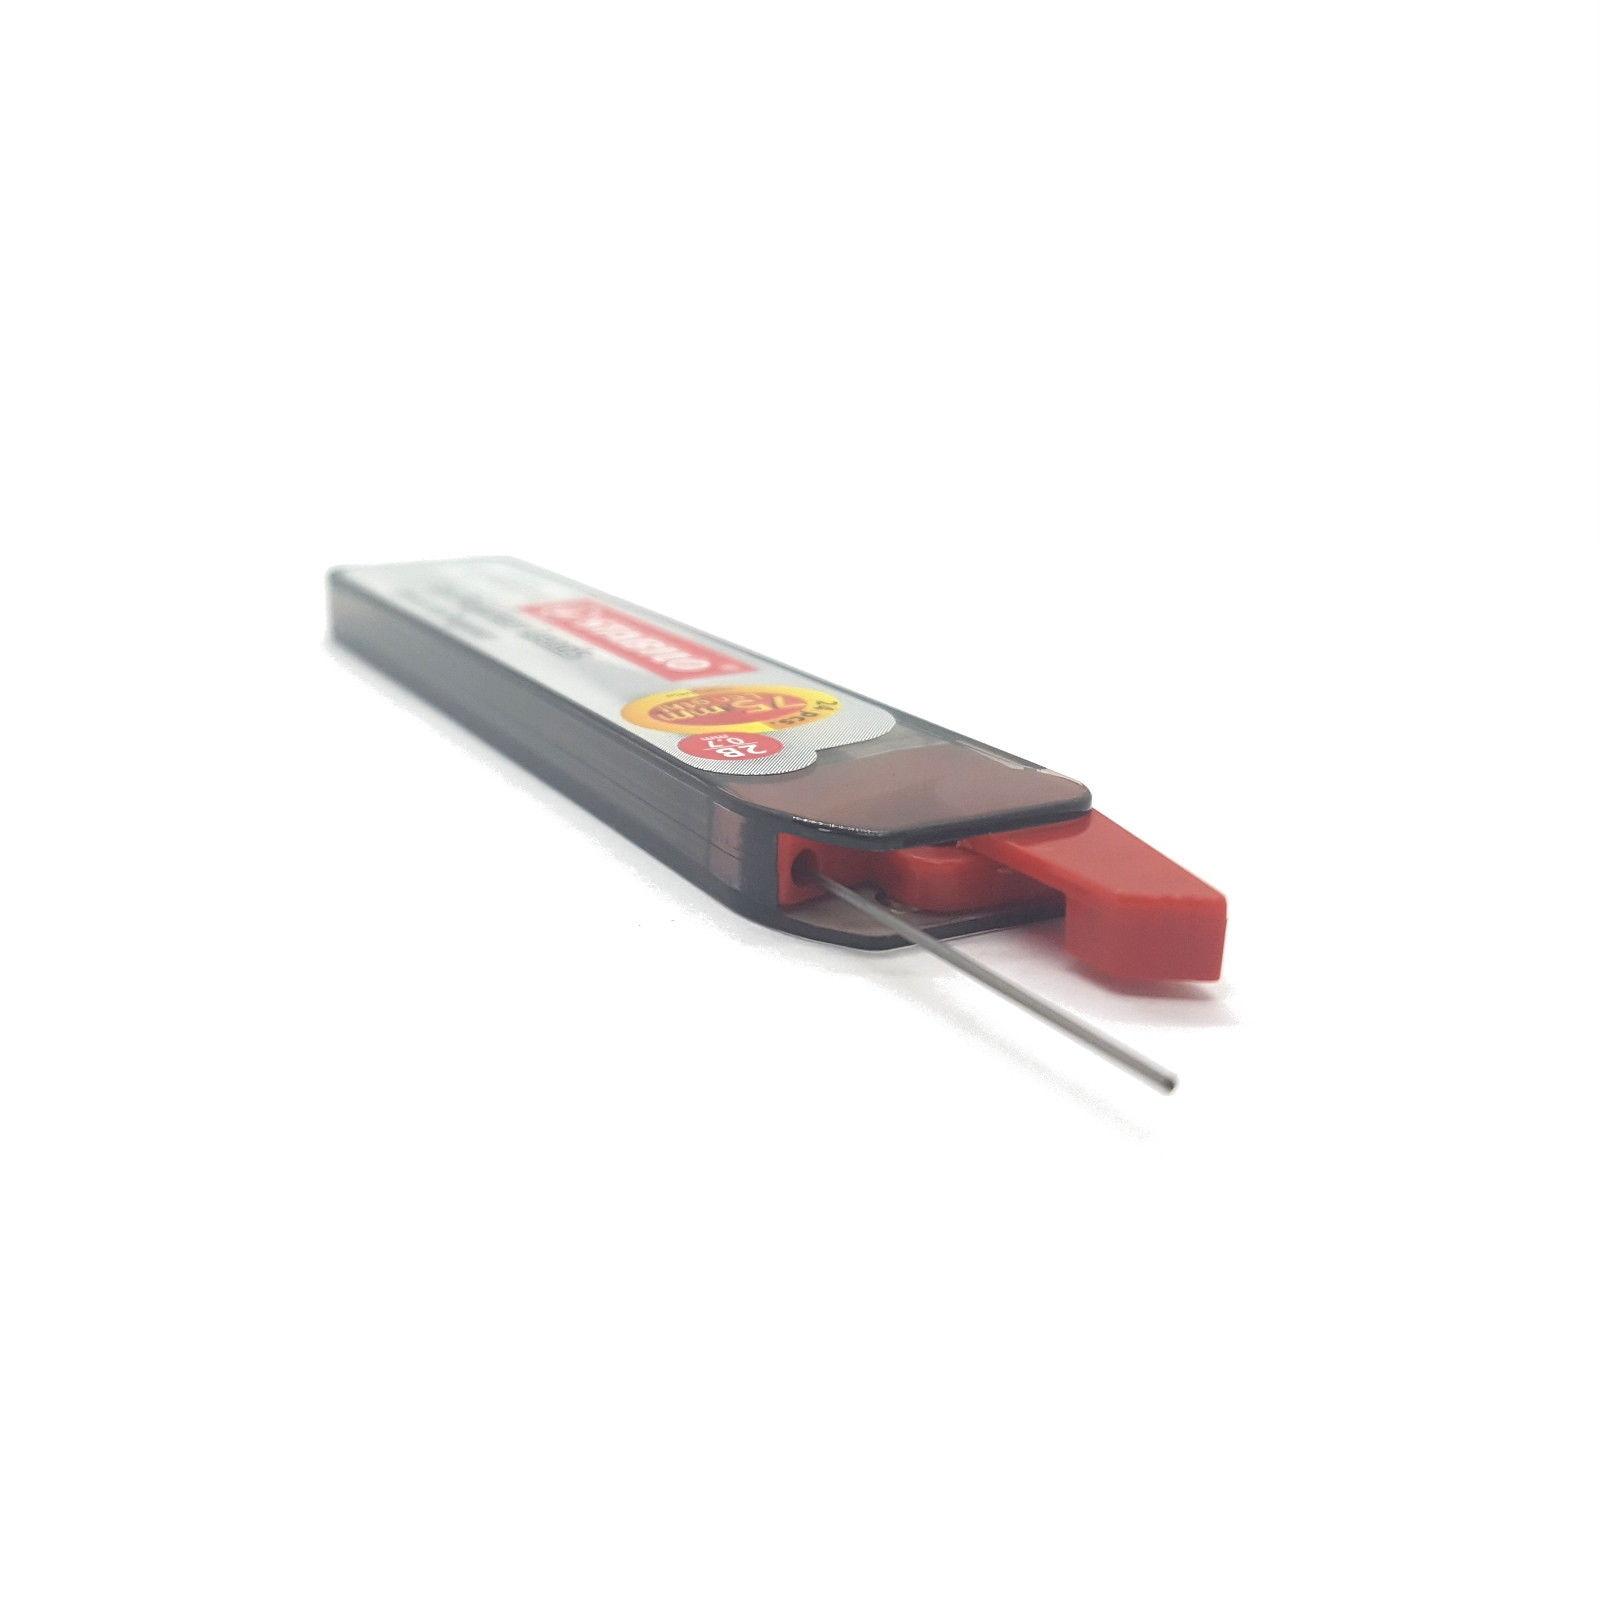 Paquete de 12 Stabilo Hola-polímero de plomo negro HB/2B/0,5/0,7mm   Recambio de lápices mecánicos